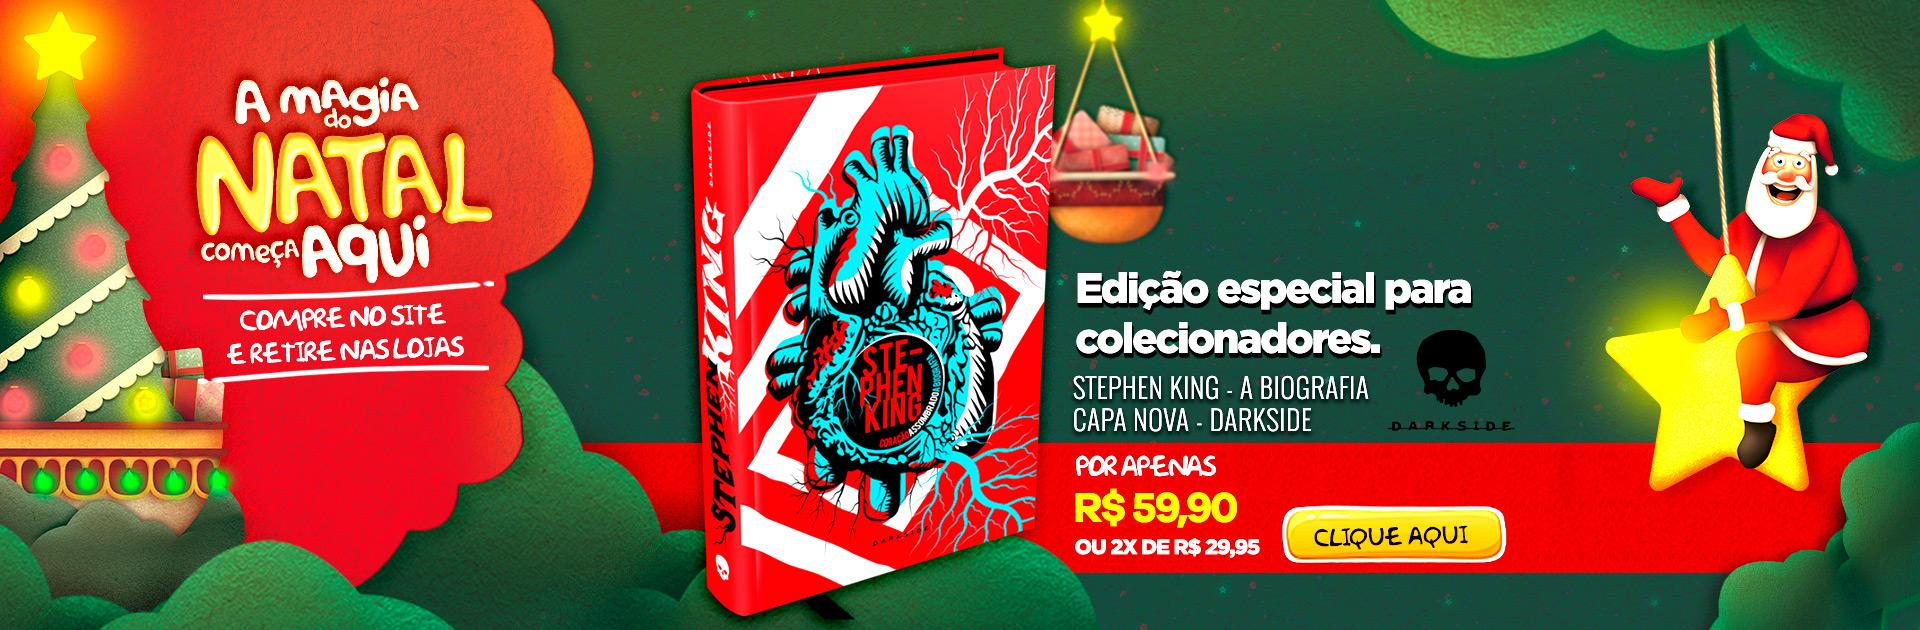 Natal - Stephen King